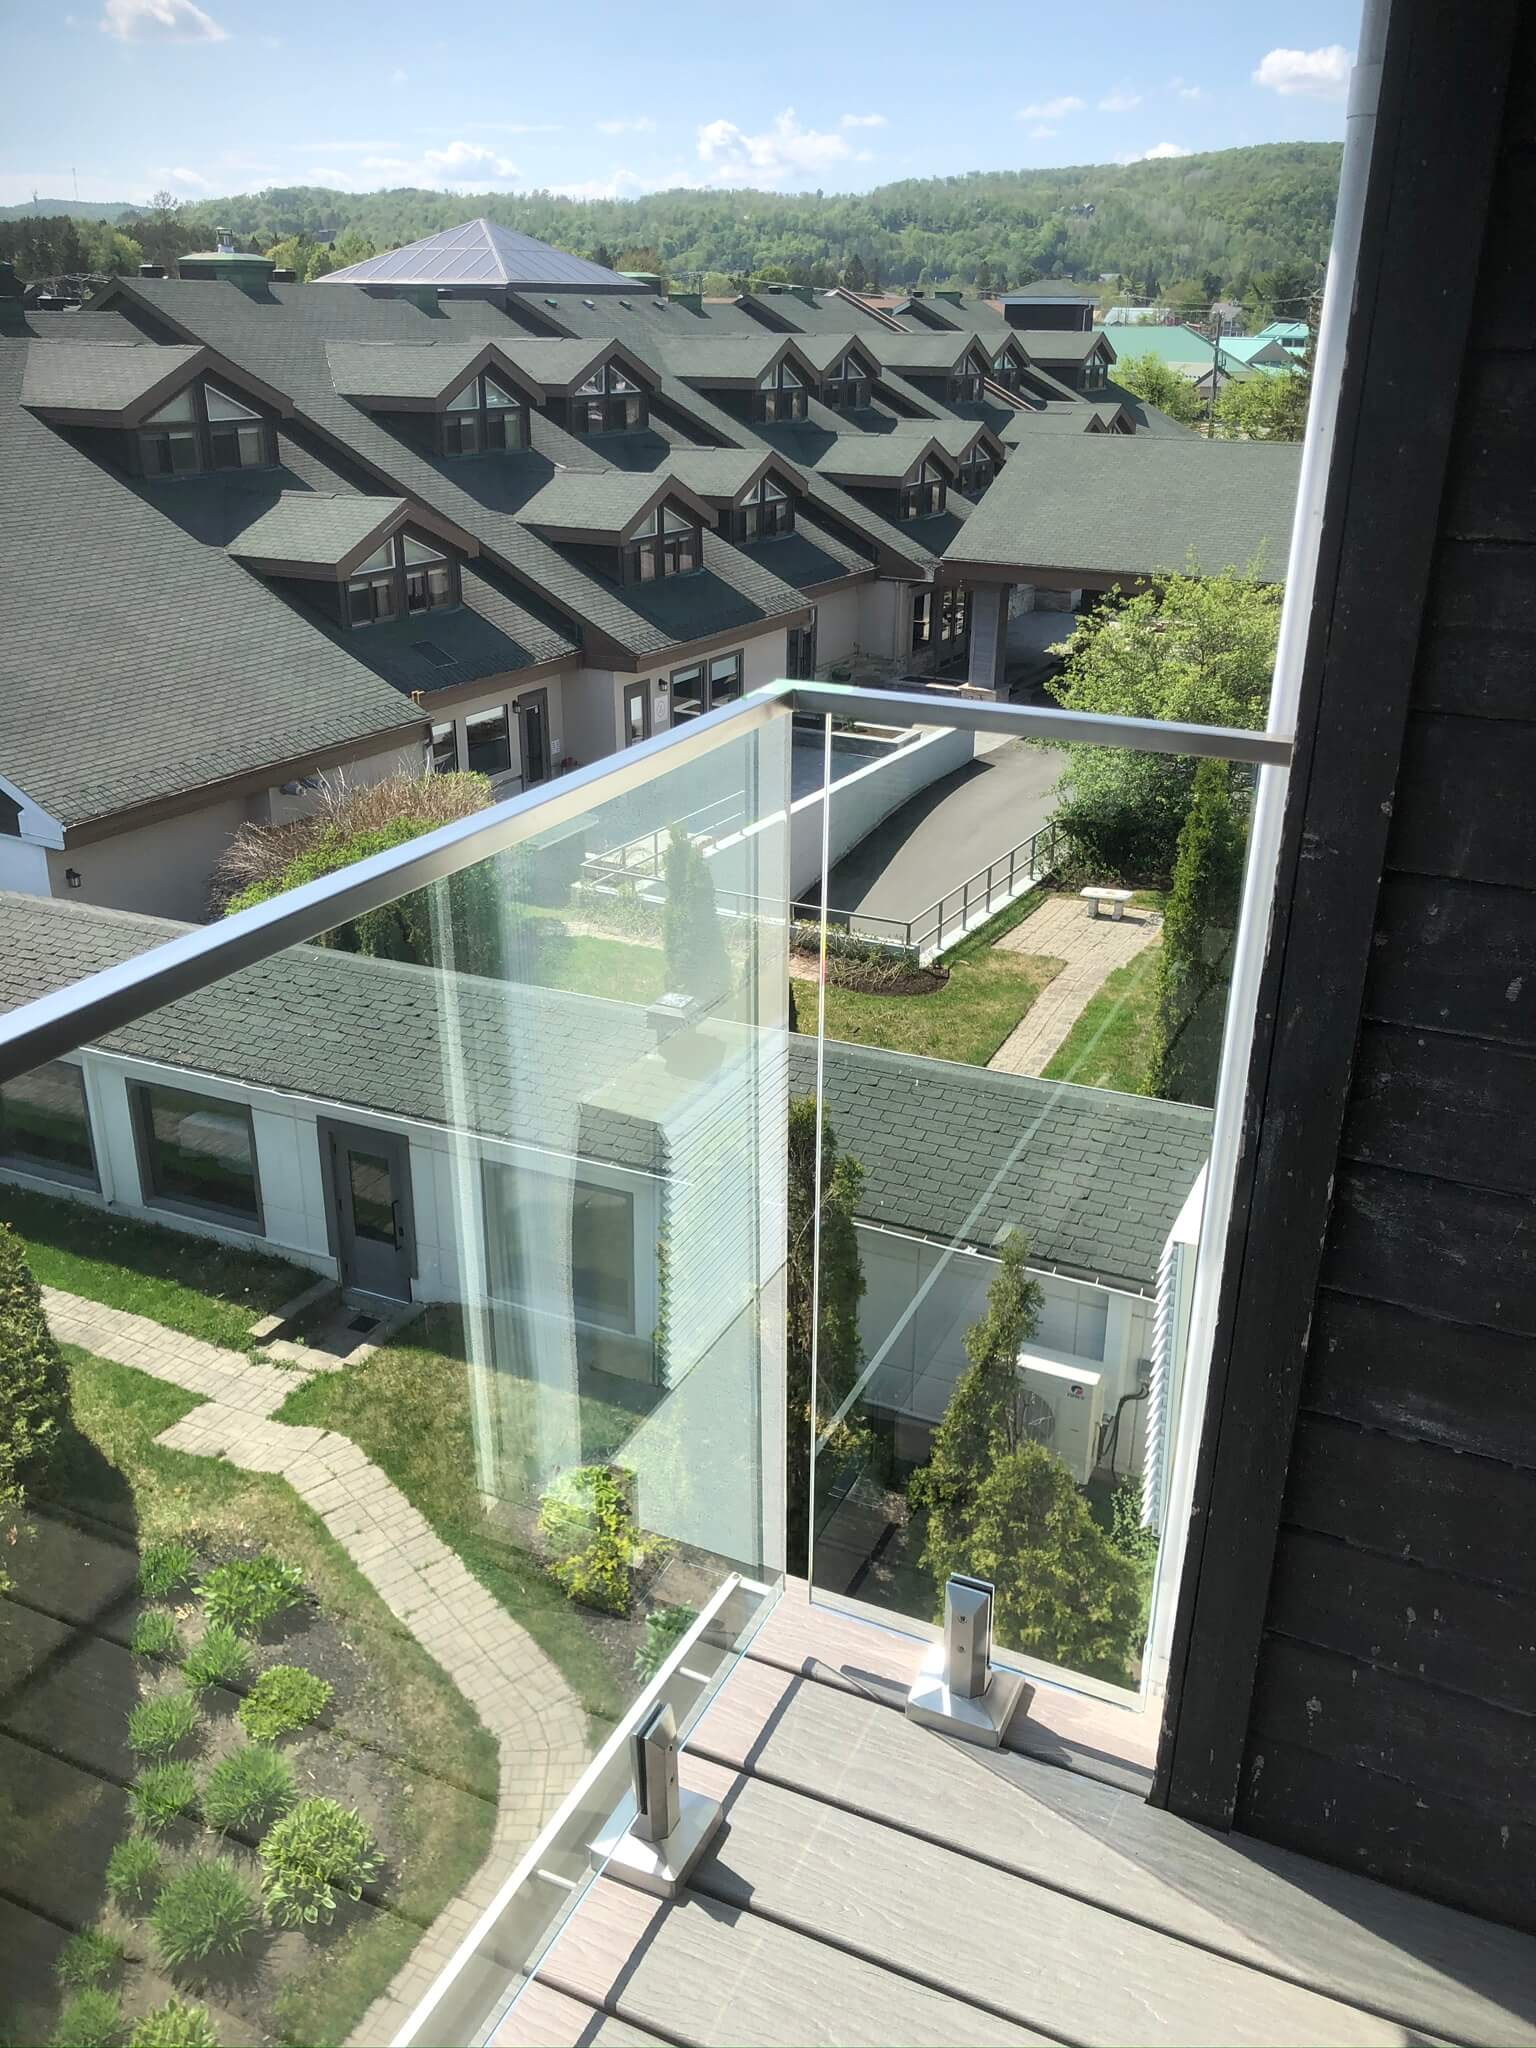 Glass railings at Manoir Saint-Sauveur